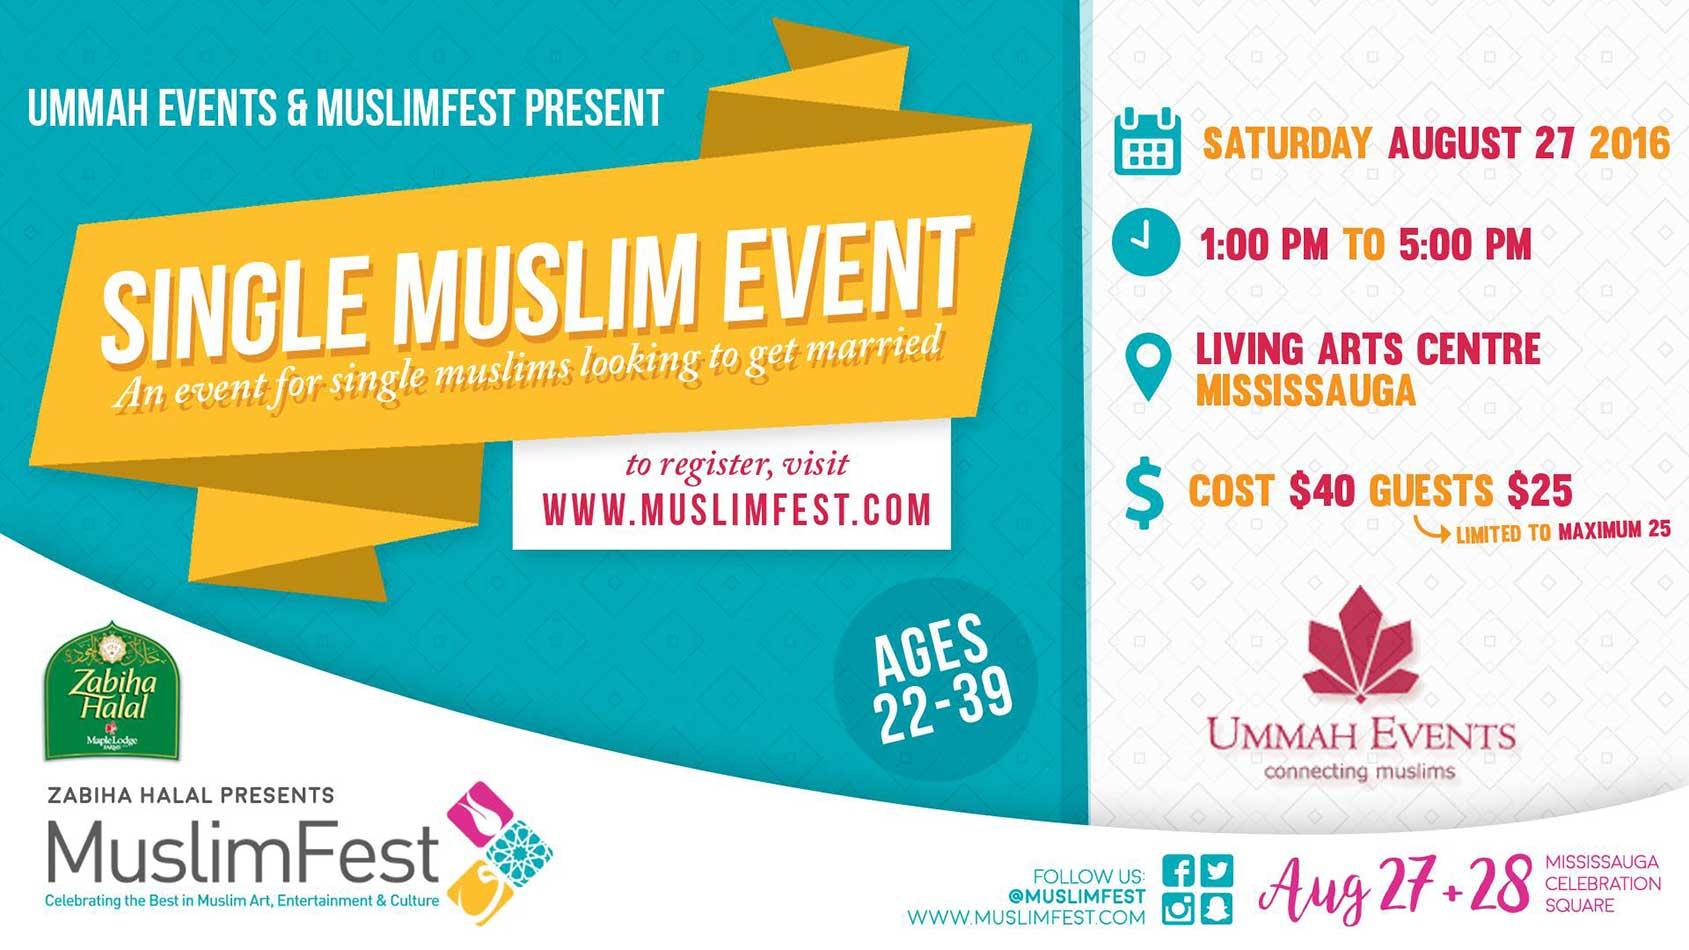 Single Muslim Event at MuslimFest 2016